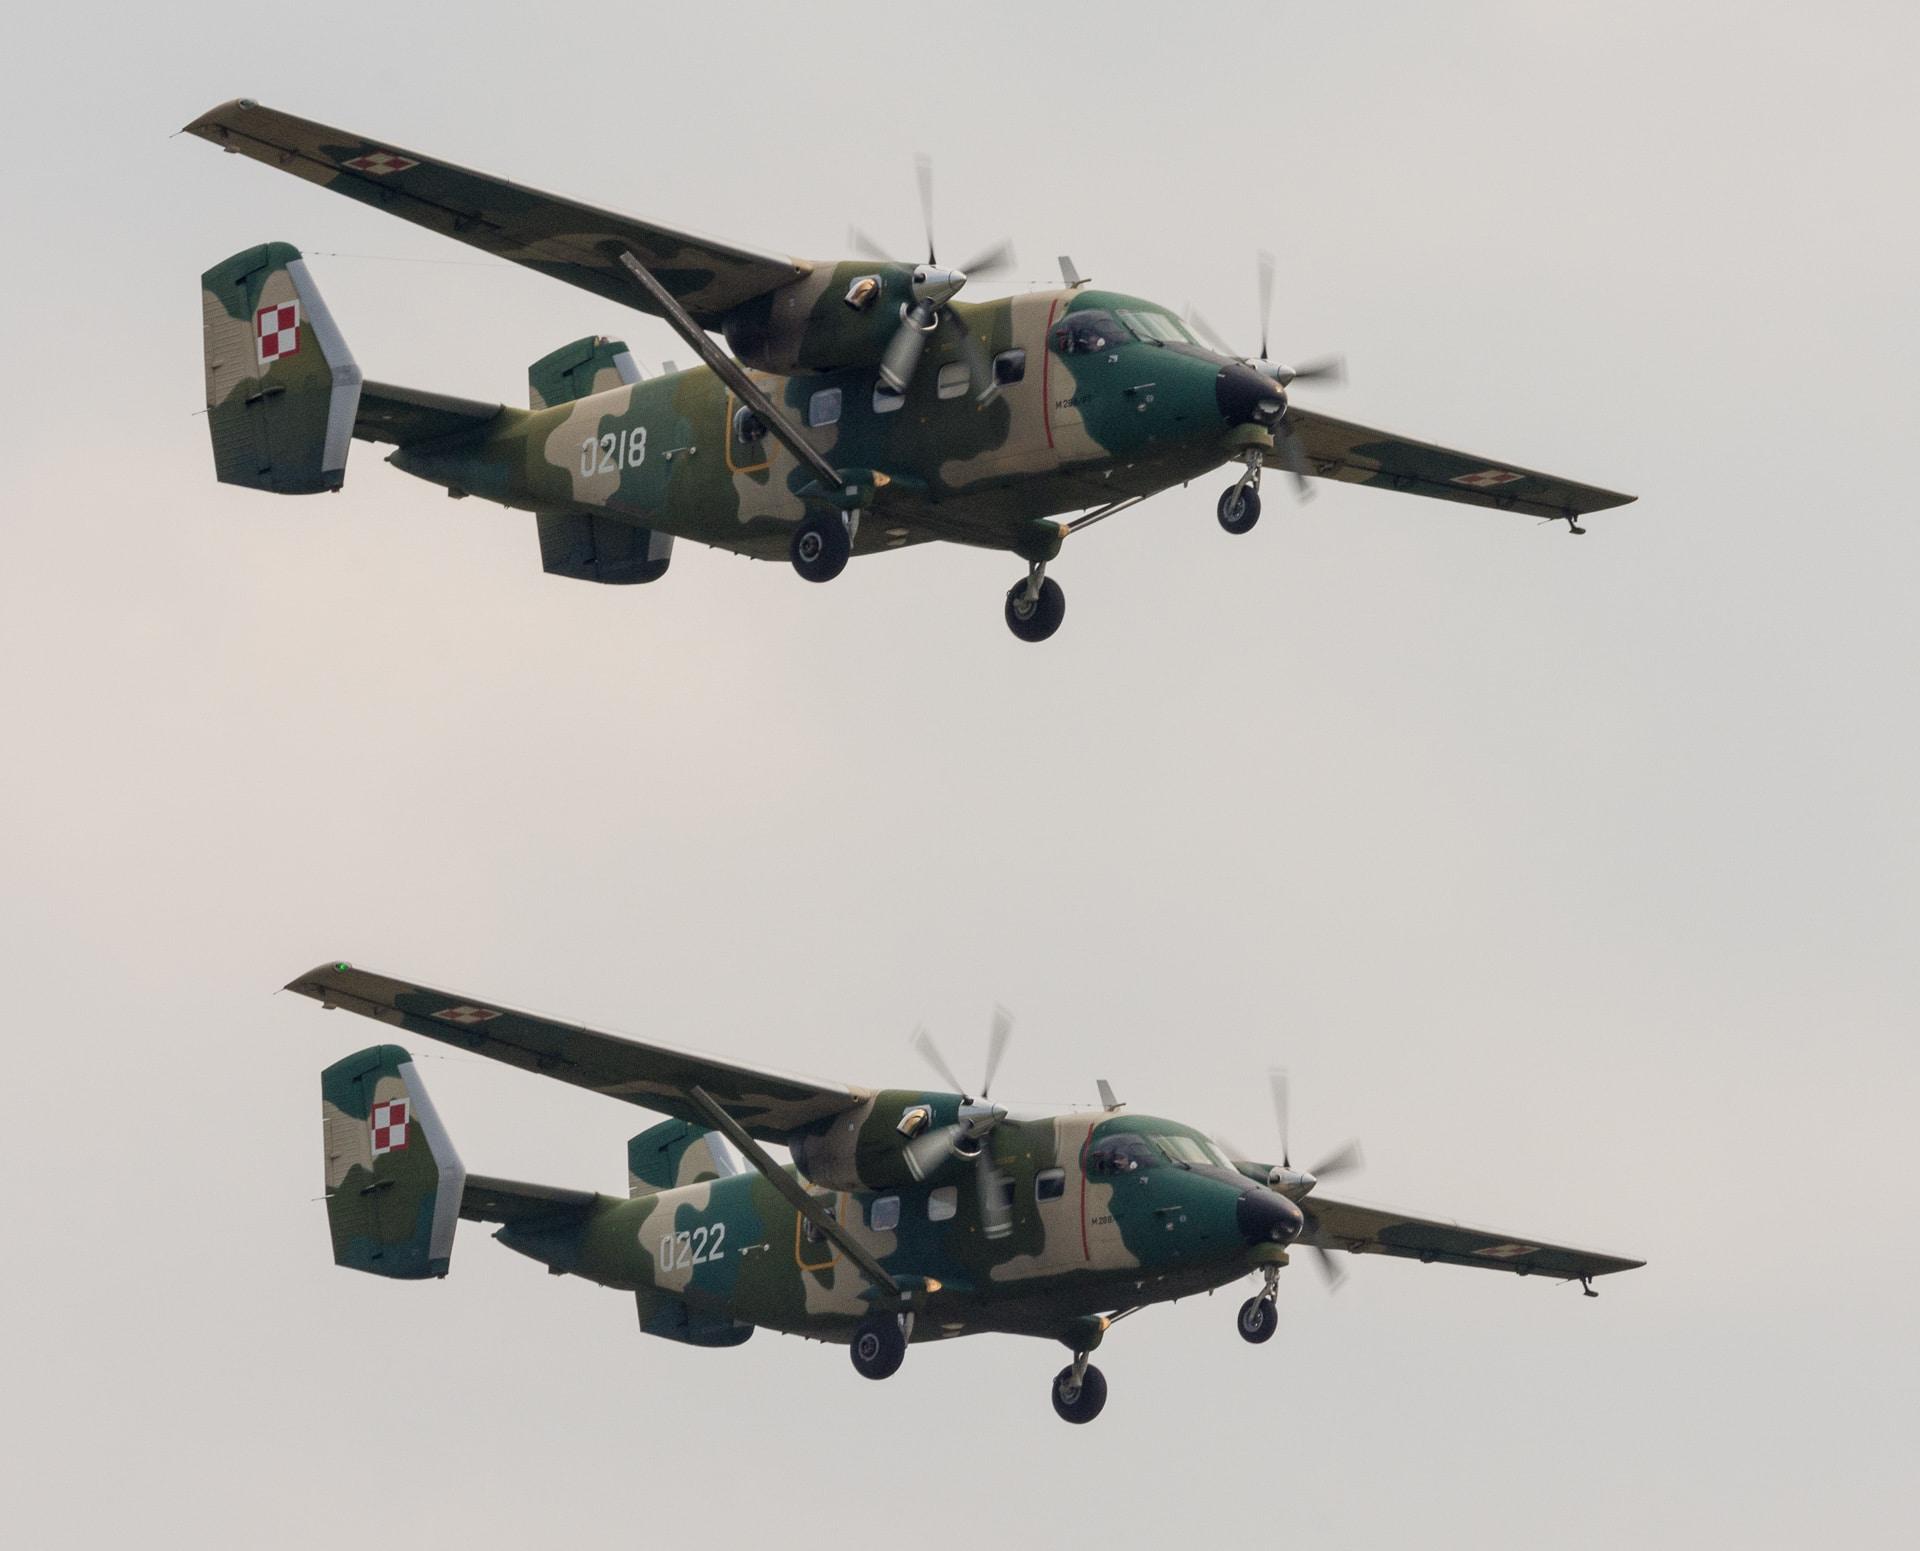 PZL M28 Skytruck/Bryza